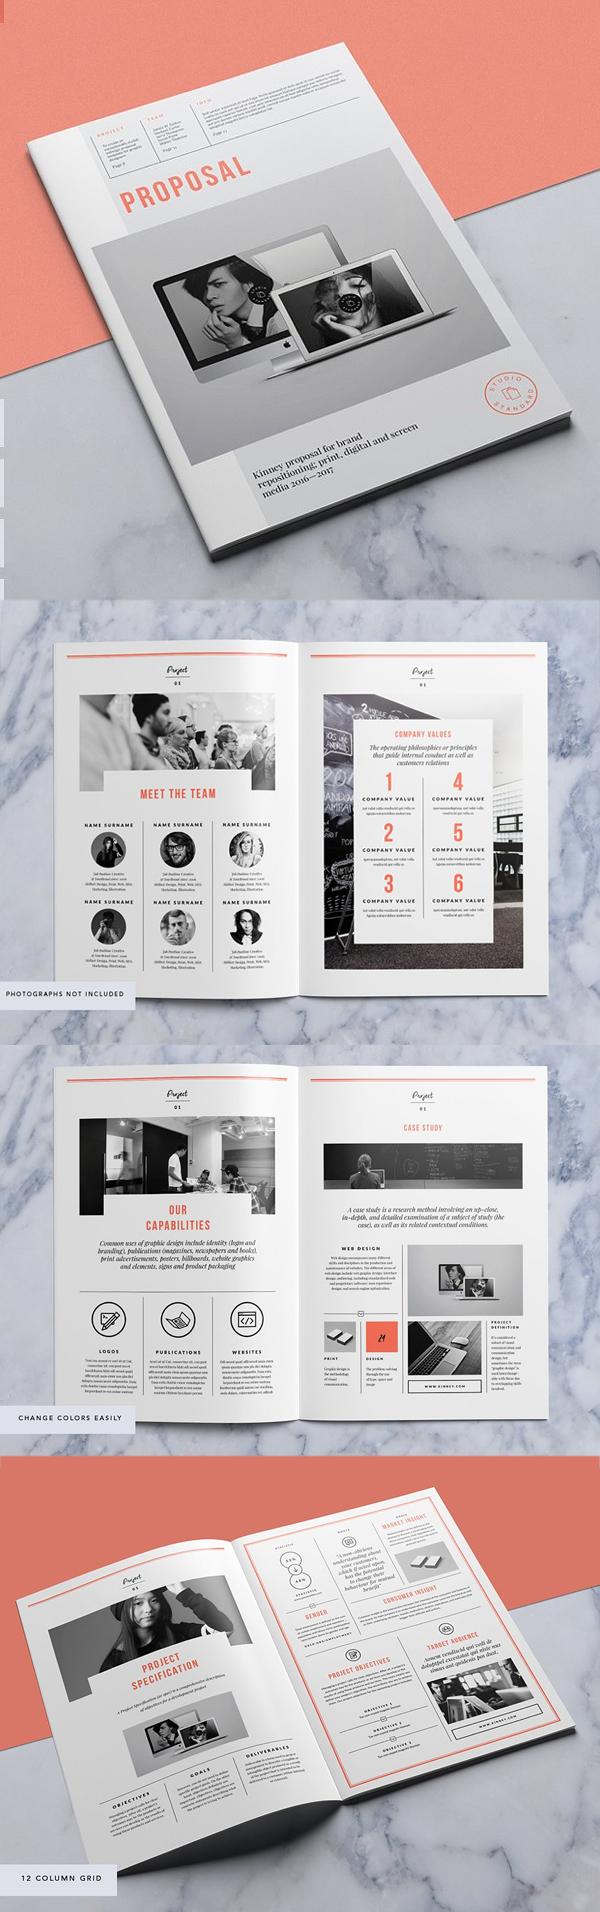 Professional Business Proposal Templates Design - 6